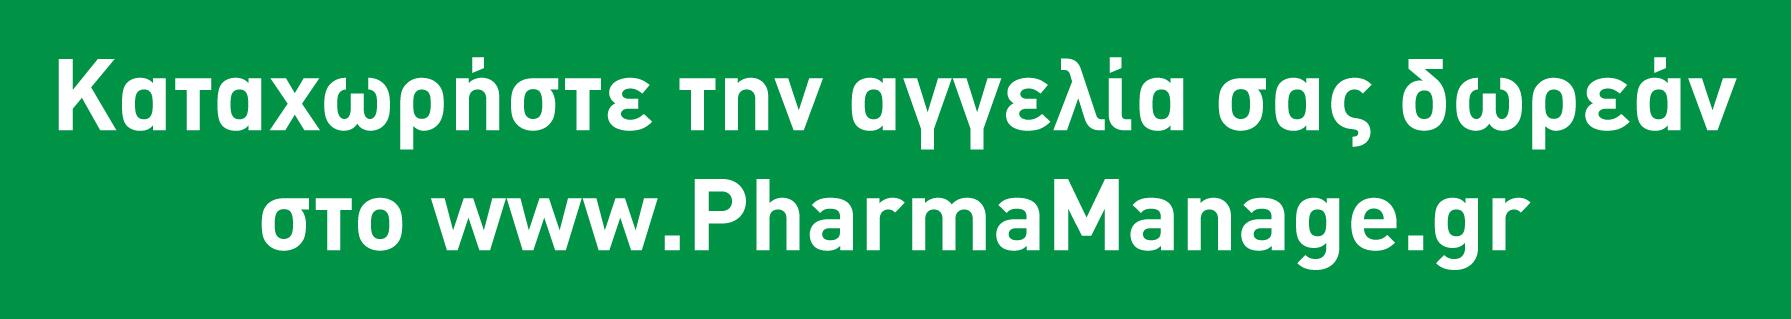 570bf0cc59b5 Πωλήσεις - Pharmacy Management